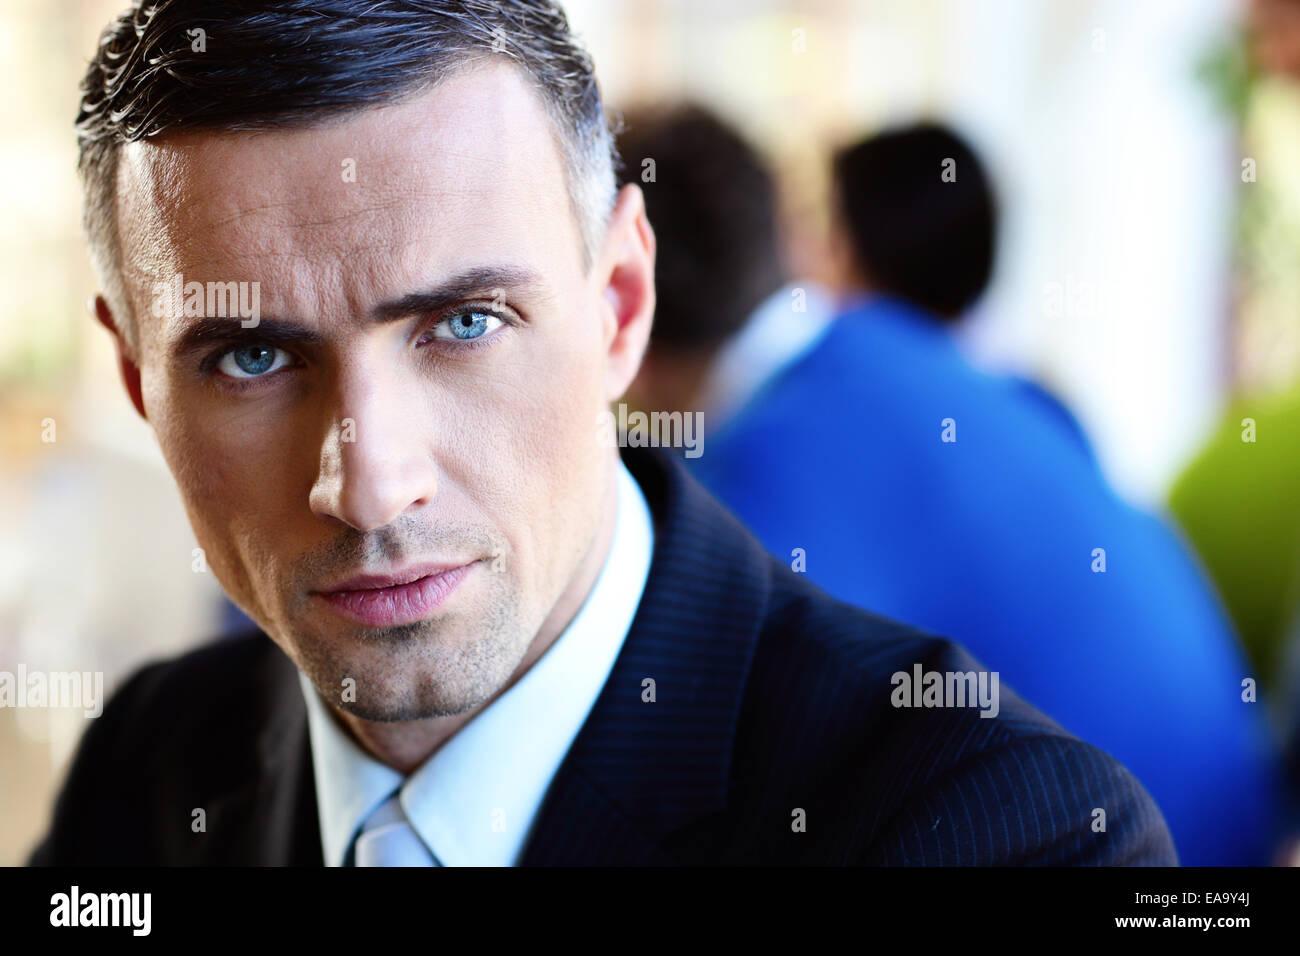 Closeup portrait of a serious businessman - Stock Image